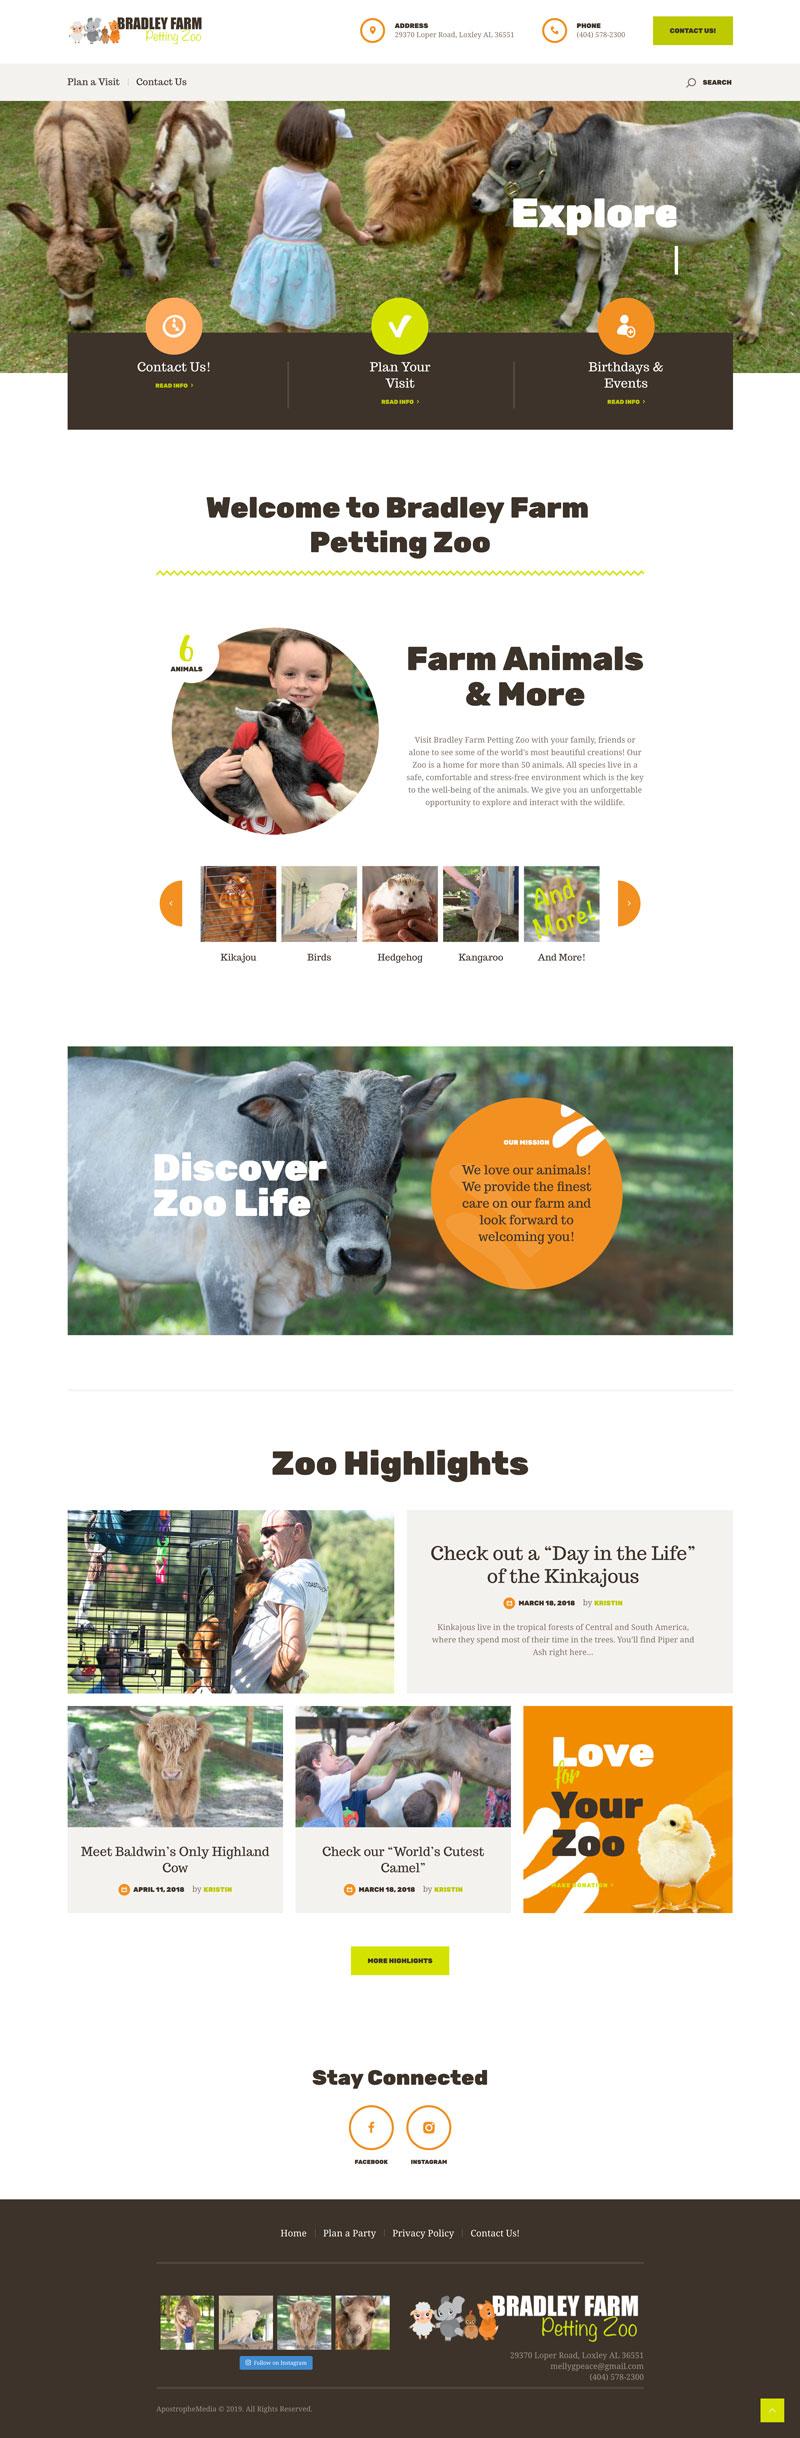 web-desigh-expert-bradley-farm-petting-zoo-2019